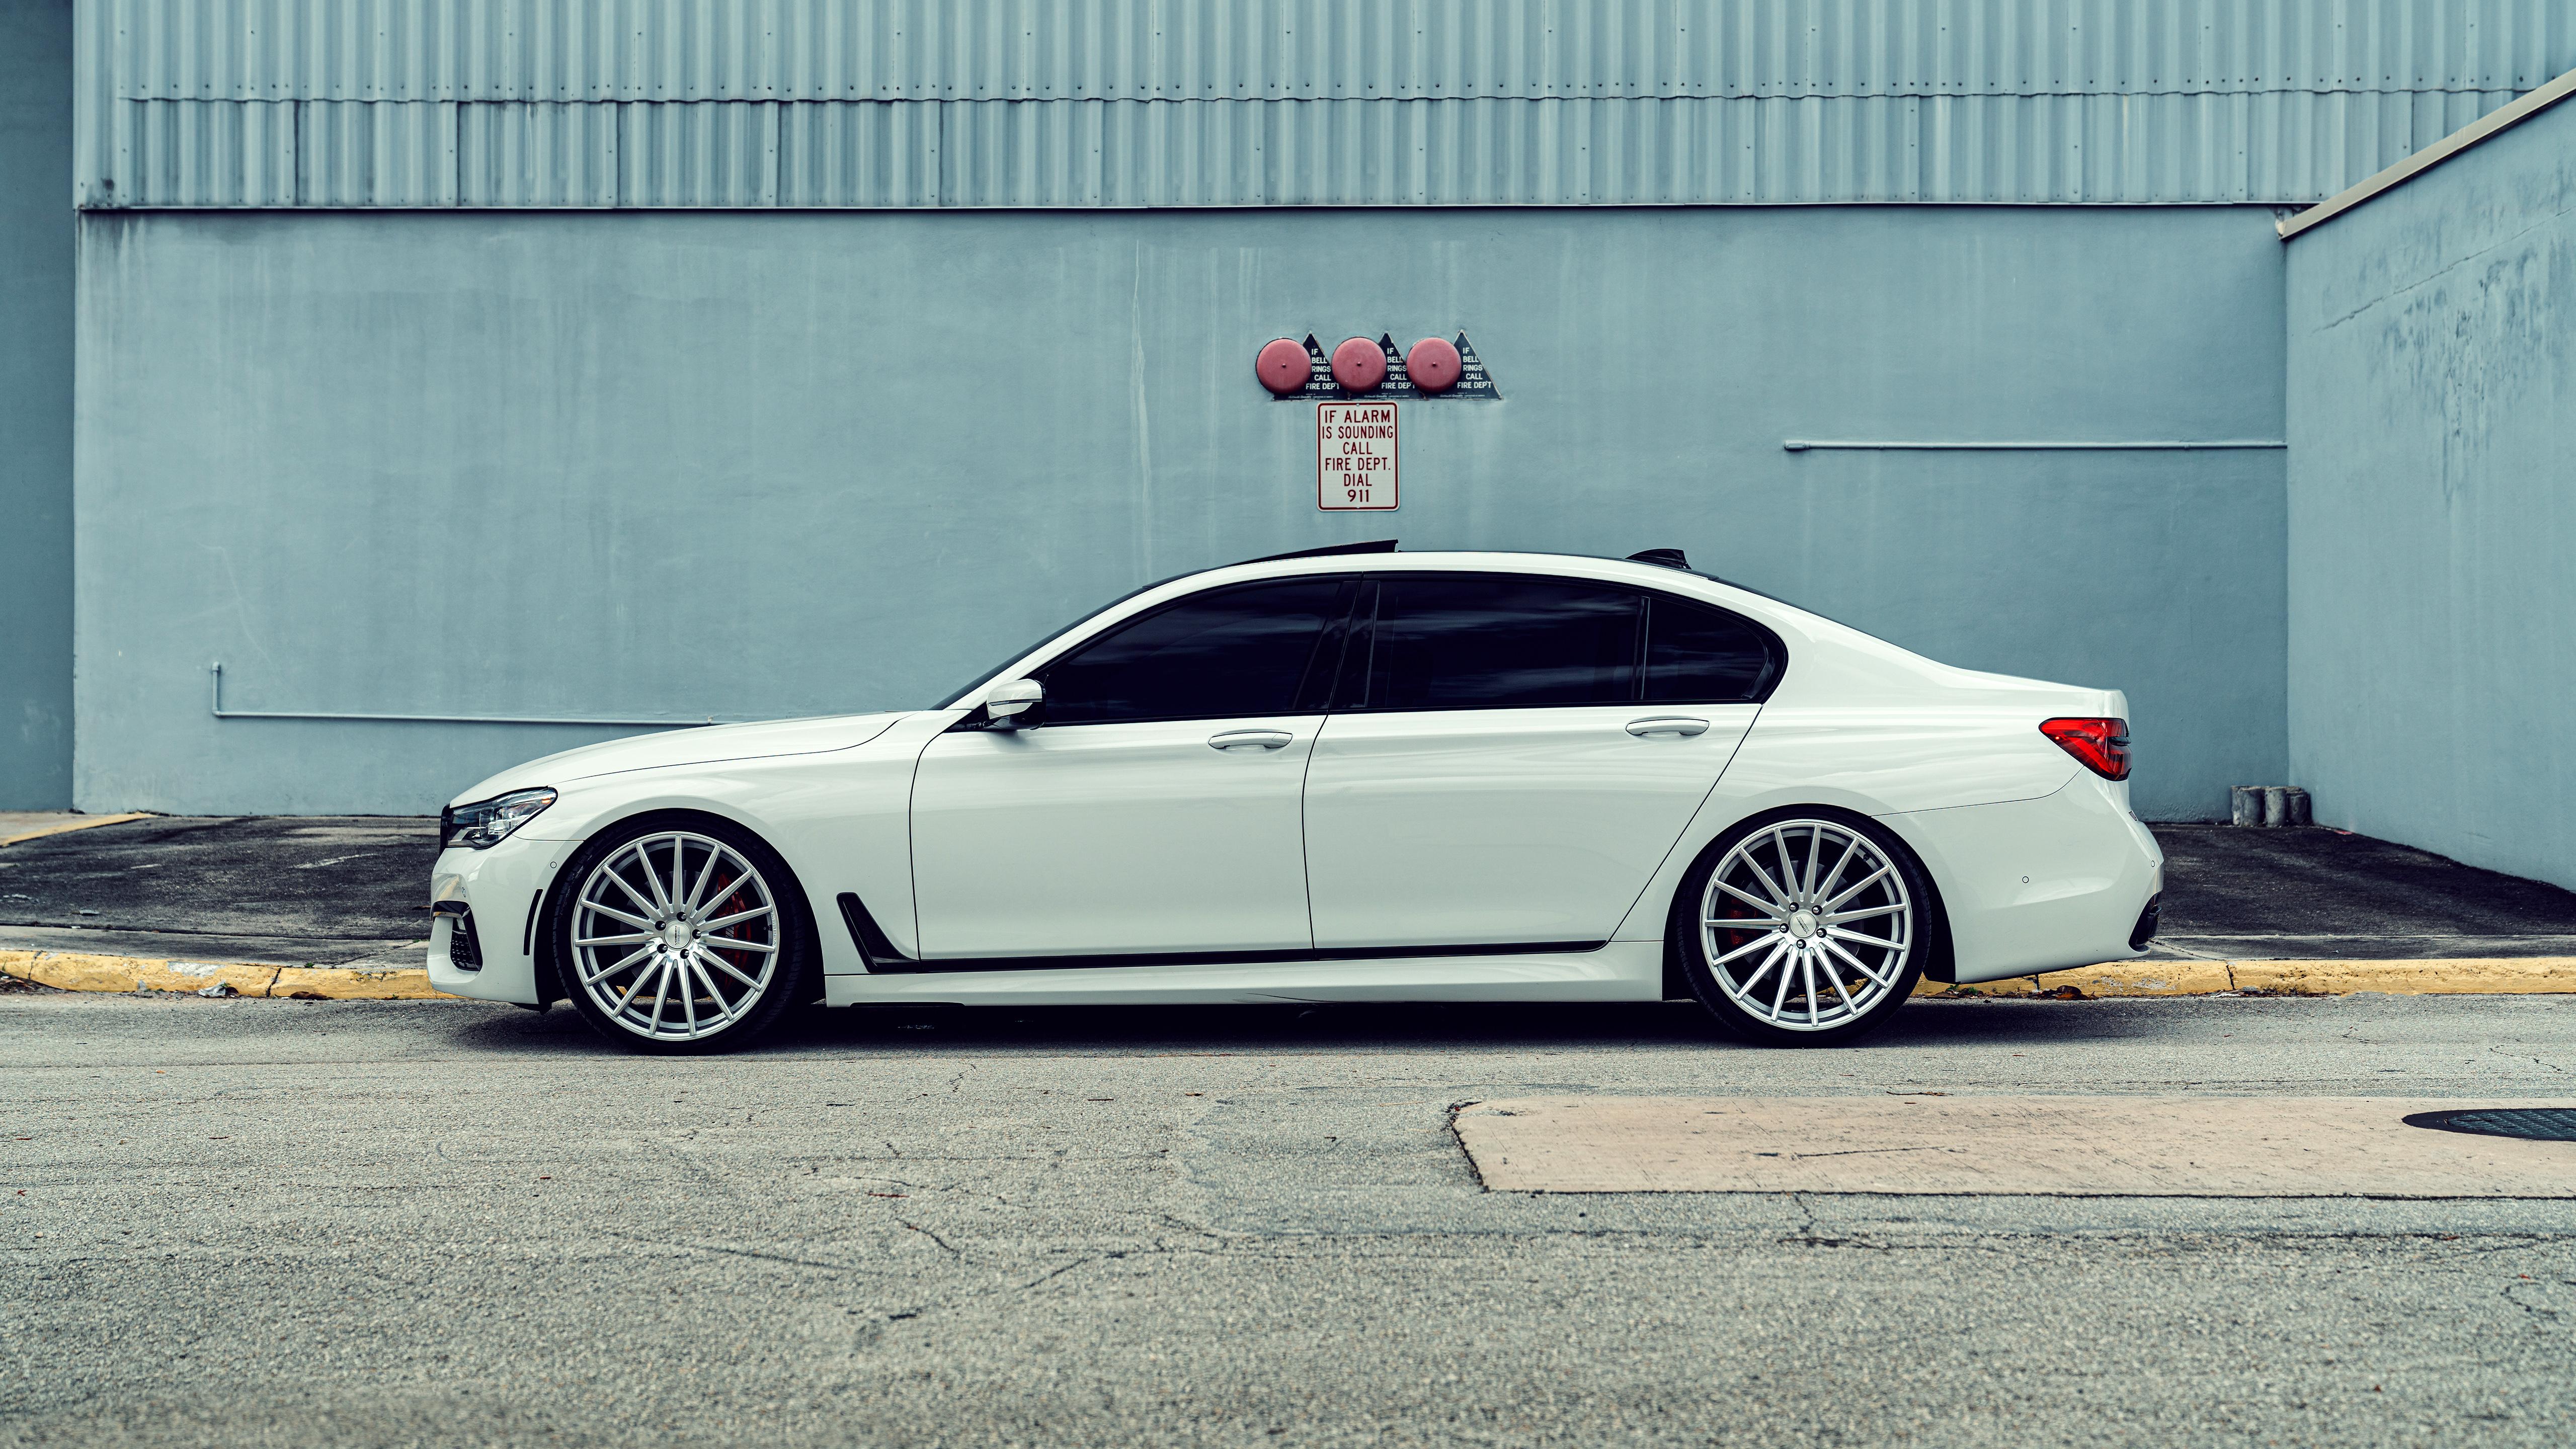 BMW 7 Series 5K 2 Wallpaper | HD Car Wallpapers | ID #15957